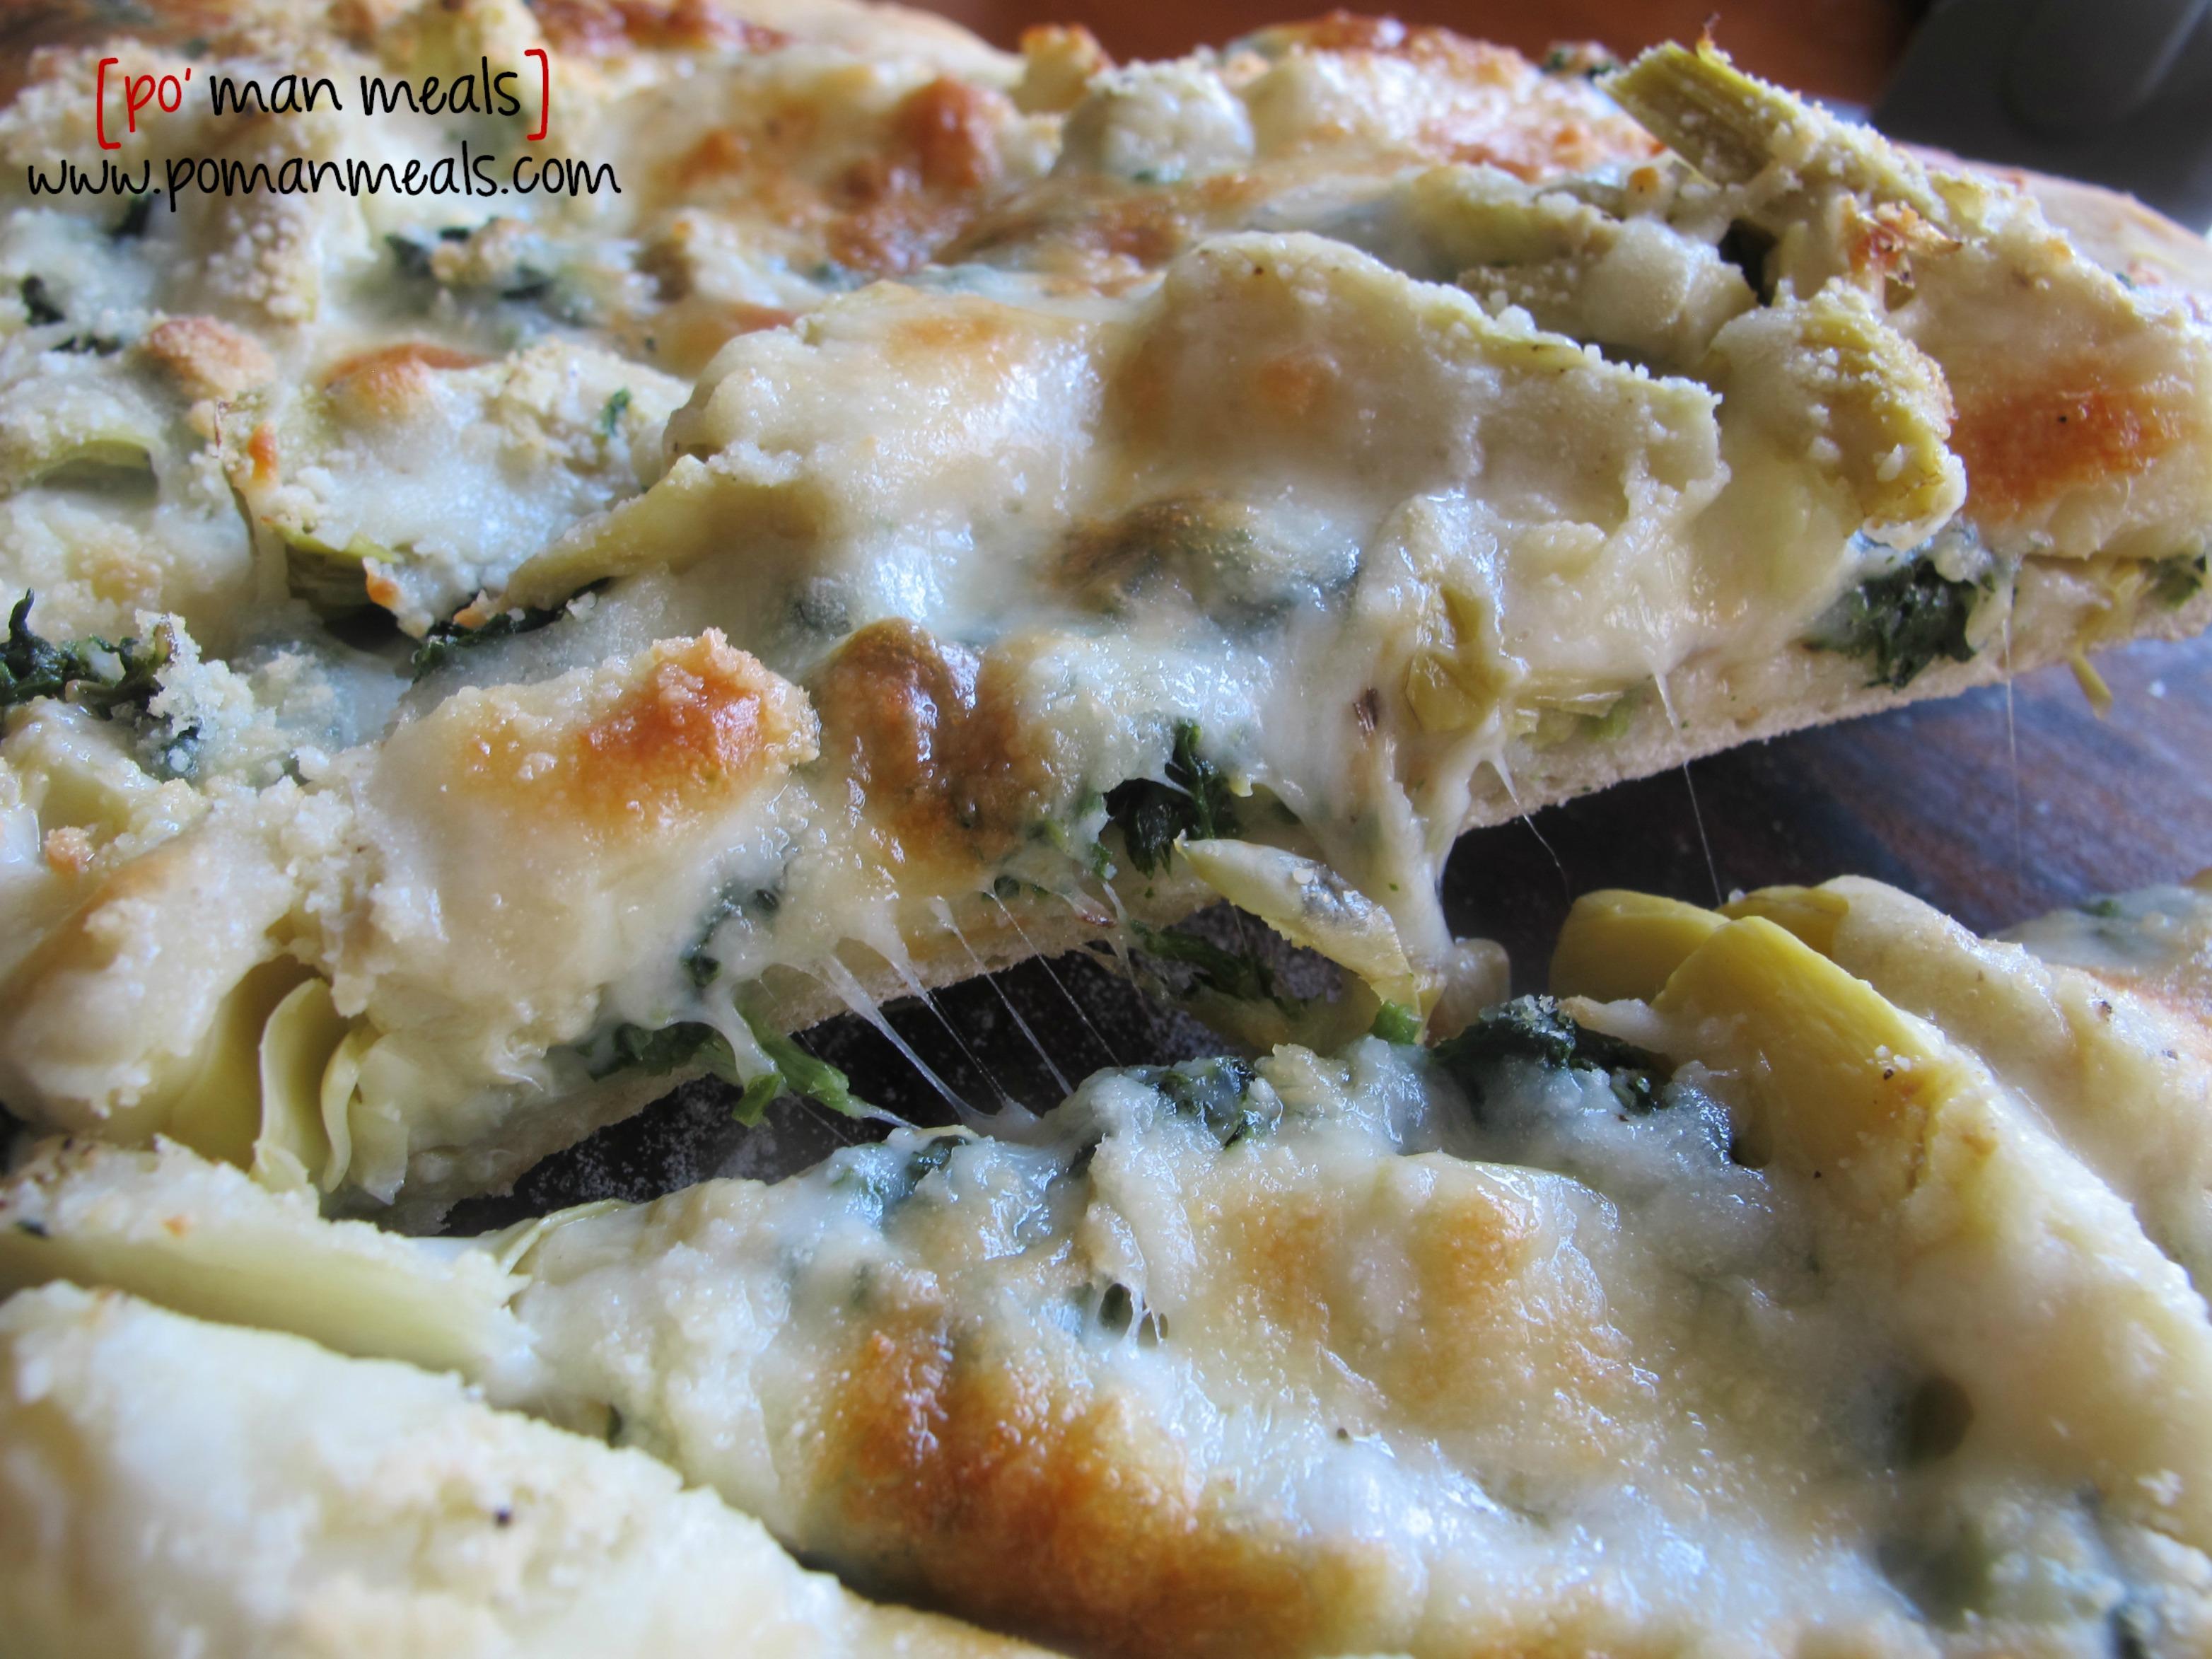 po' man meals - cheesy spinach and artichoke pizza